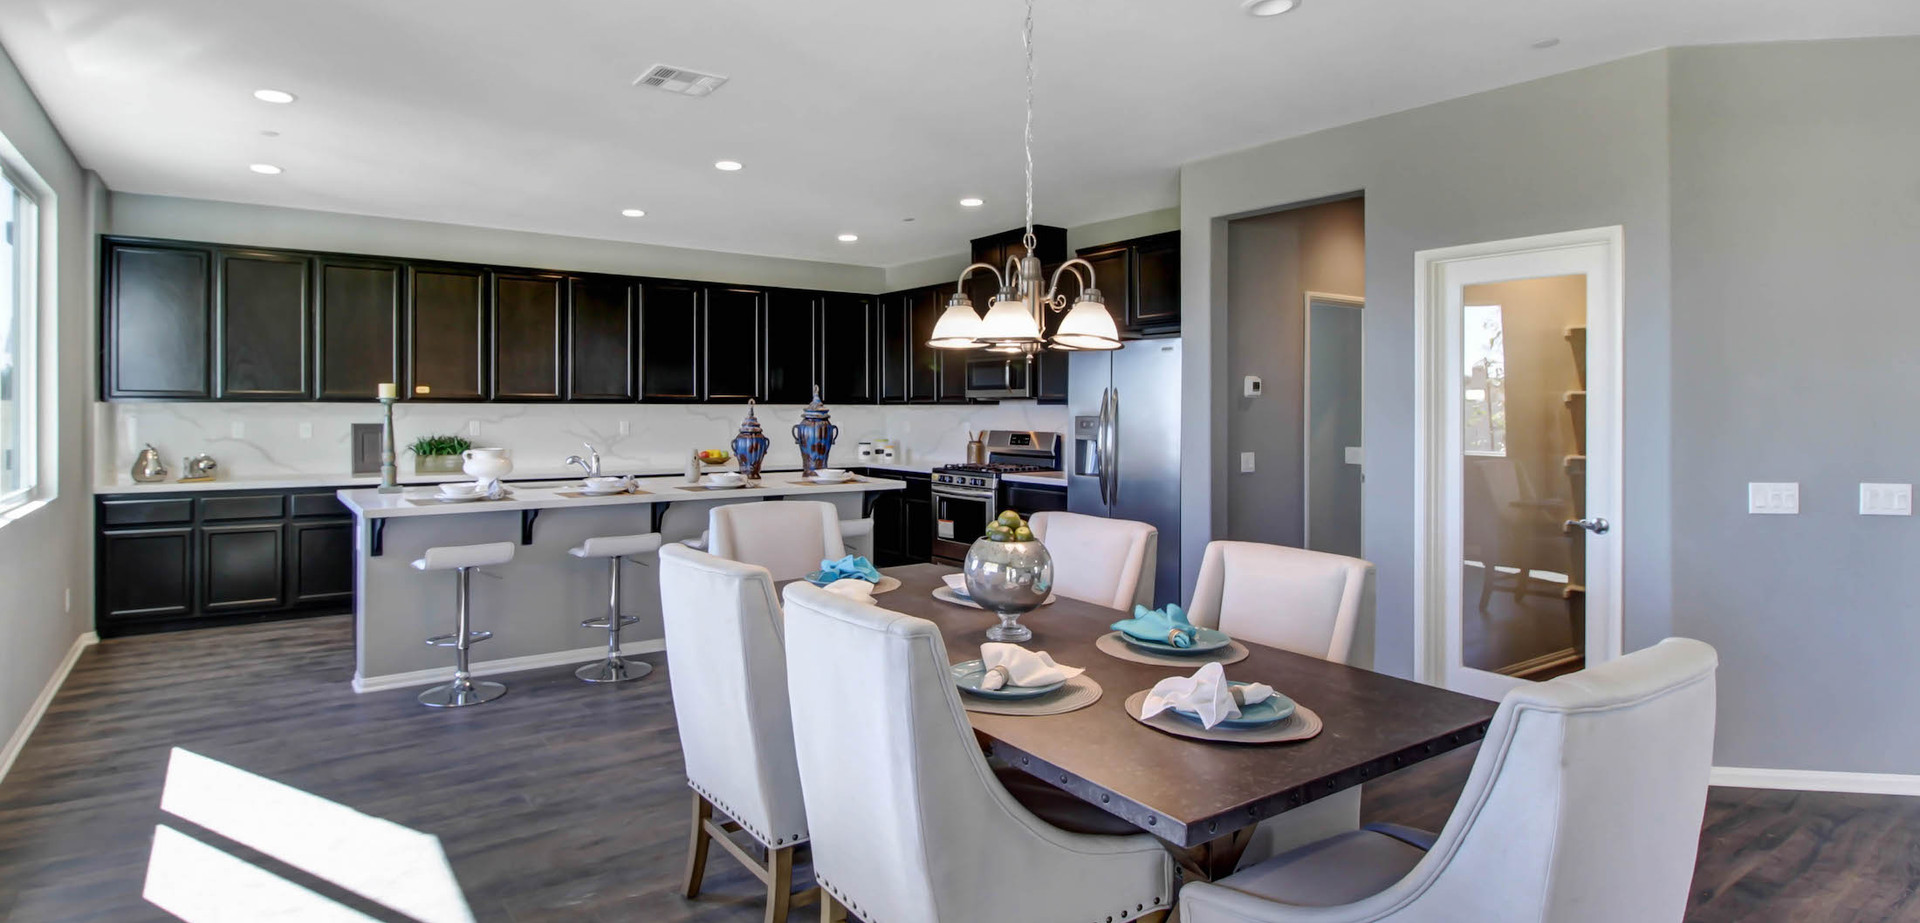 model-1 kitchen-2 2200x1500.jpg